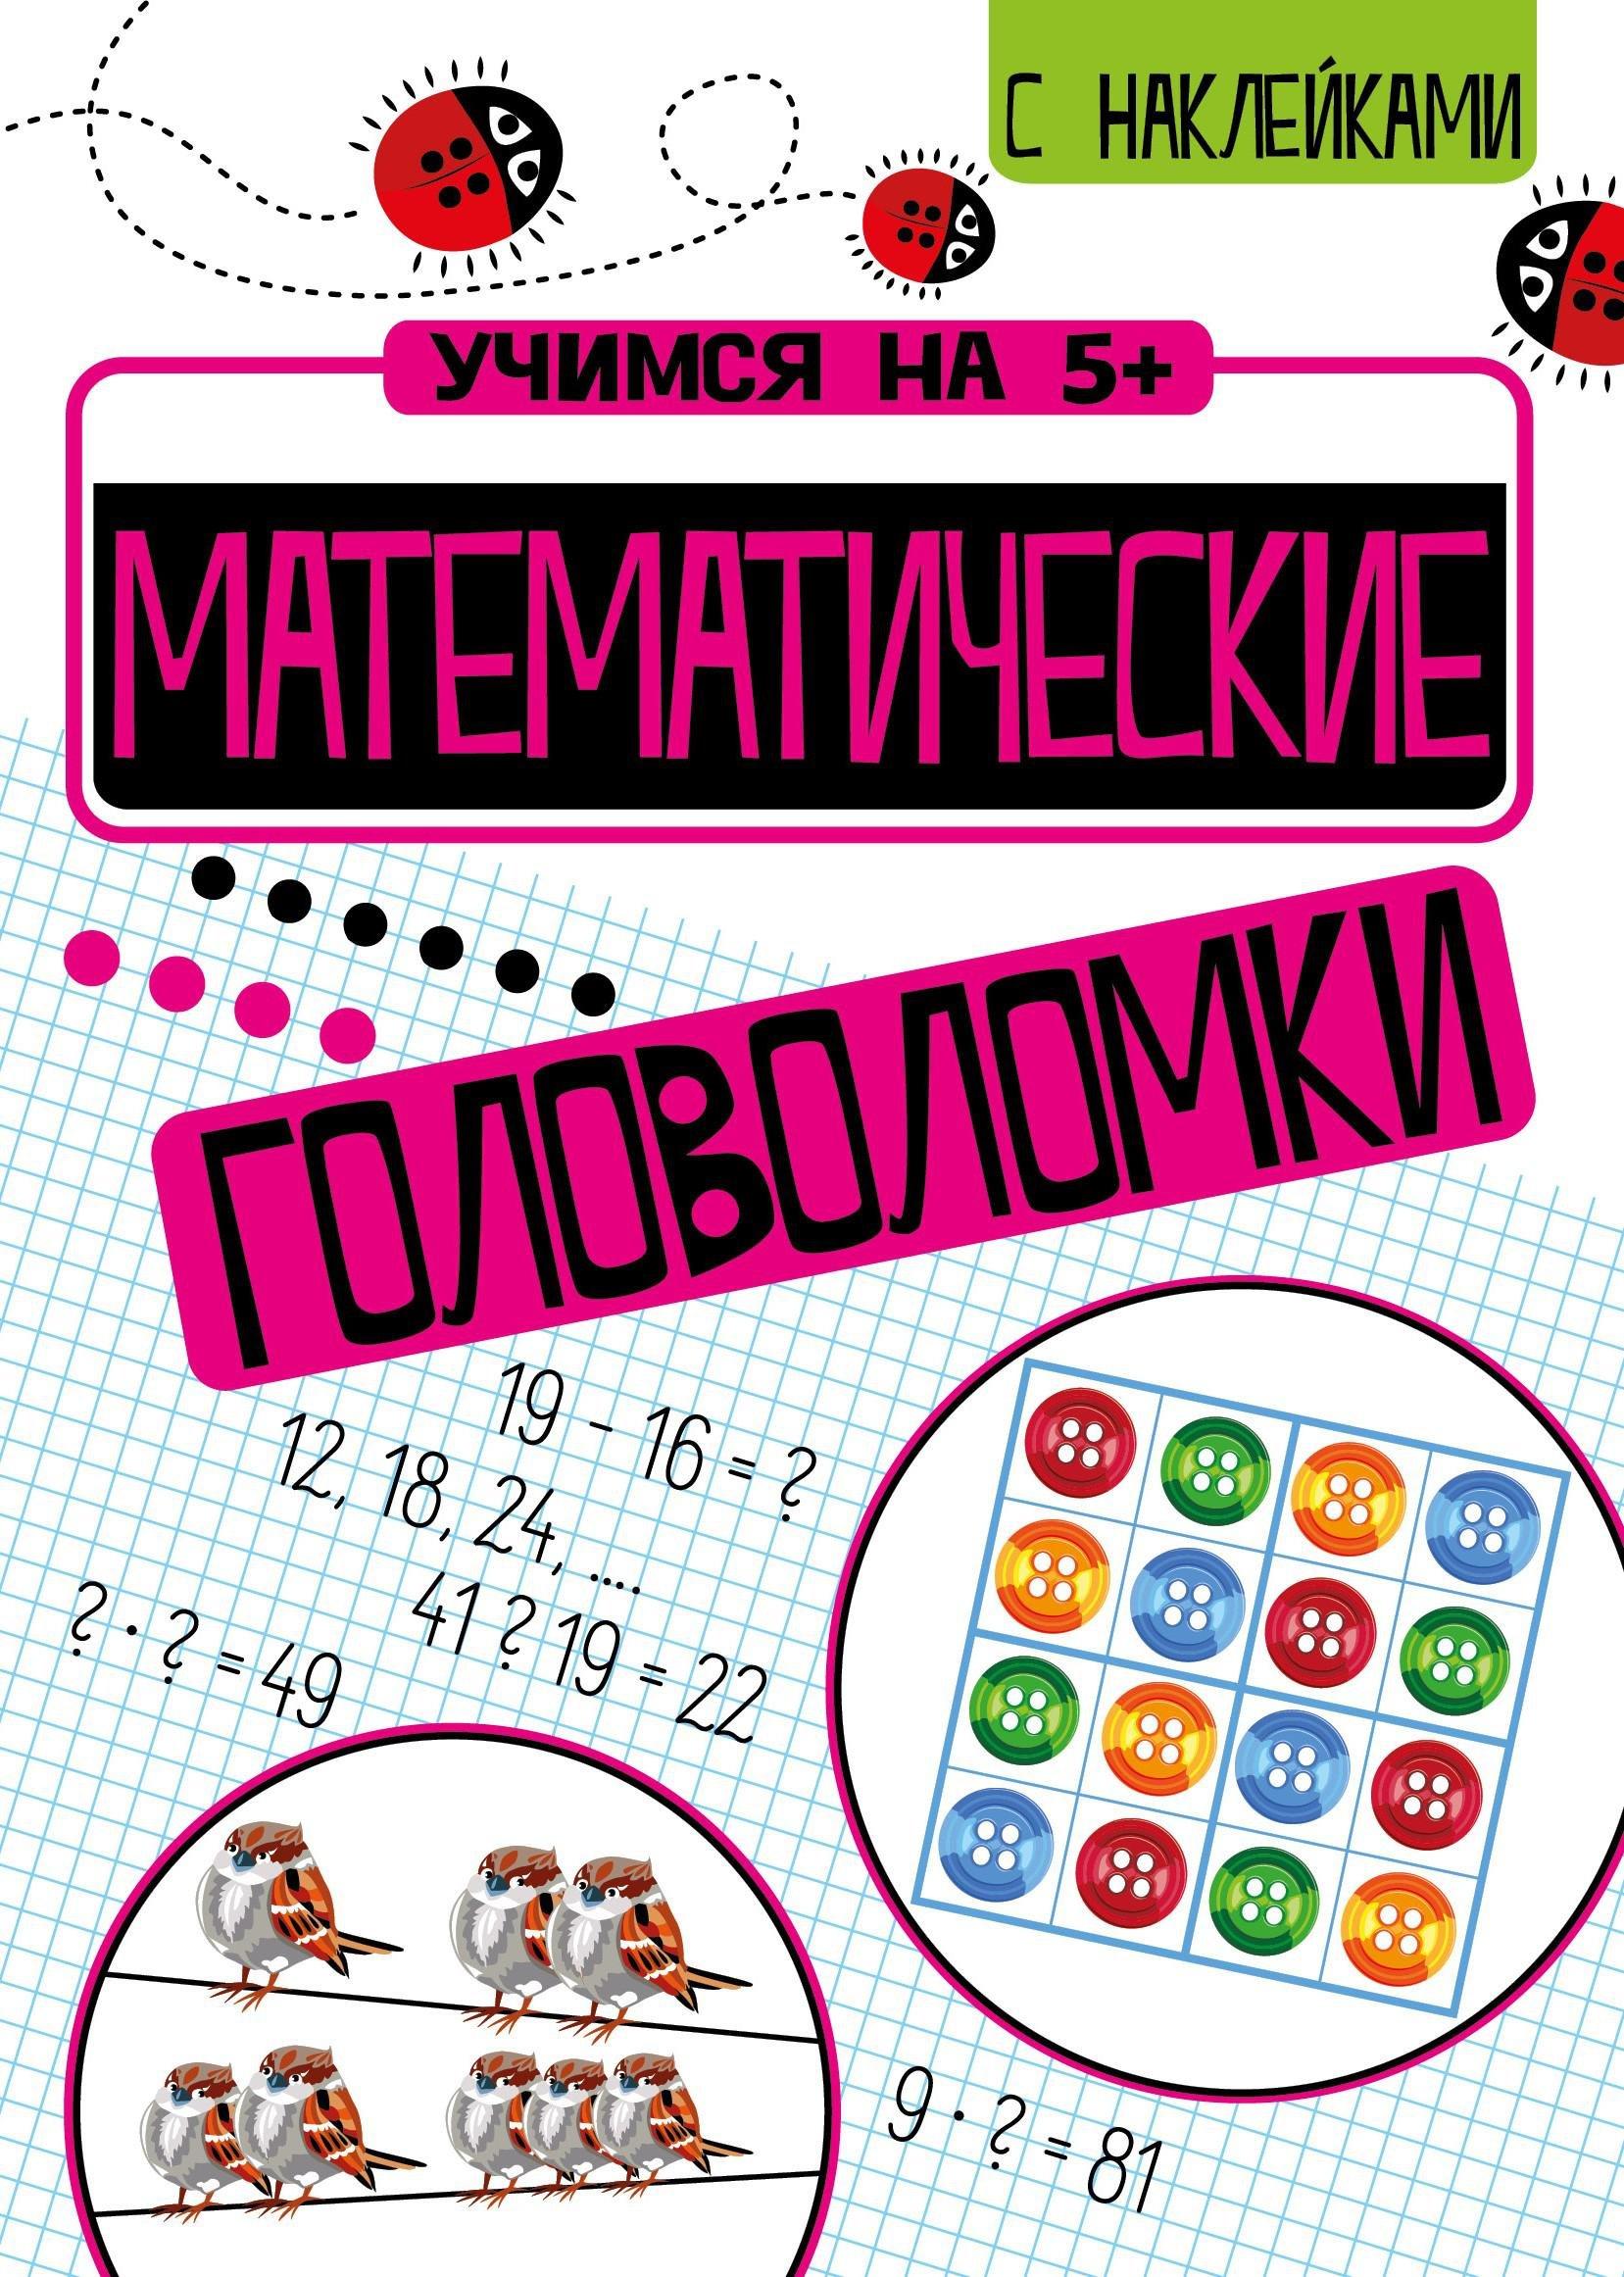 Учимся на 5+ Математические головоломки